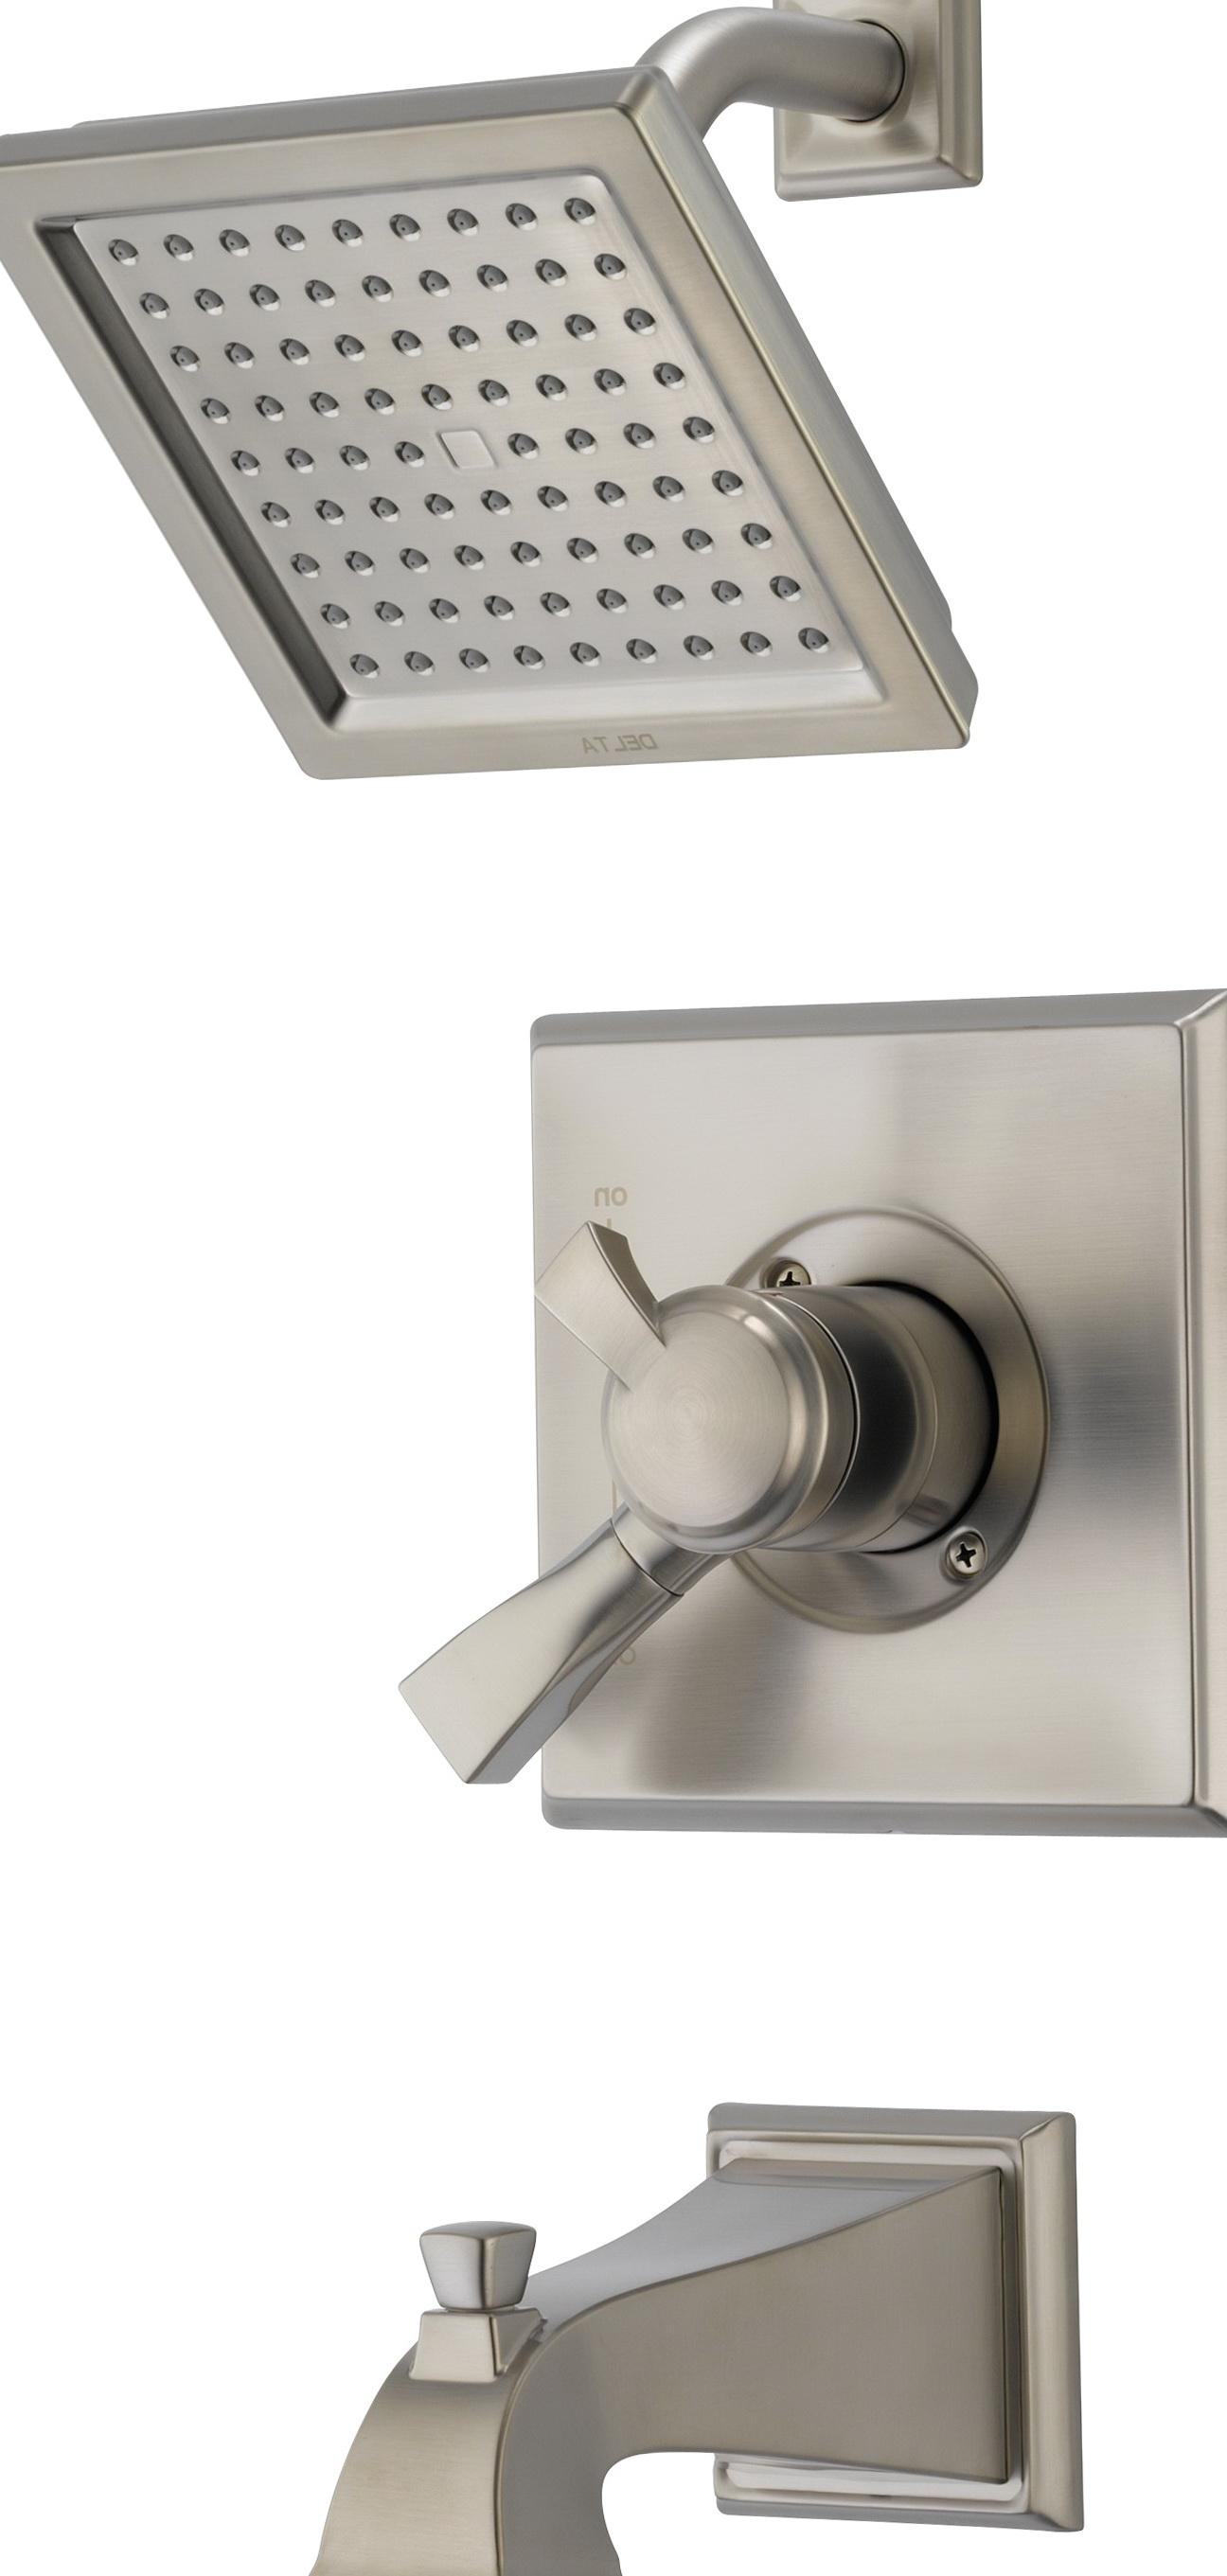 Lowes Bathroom Faucets Delta